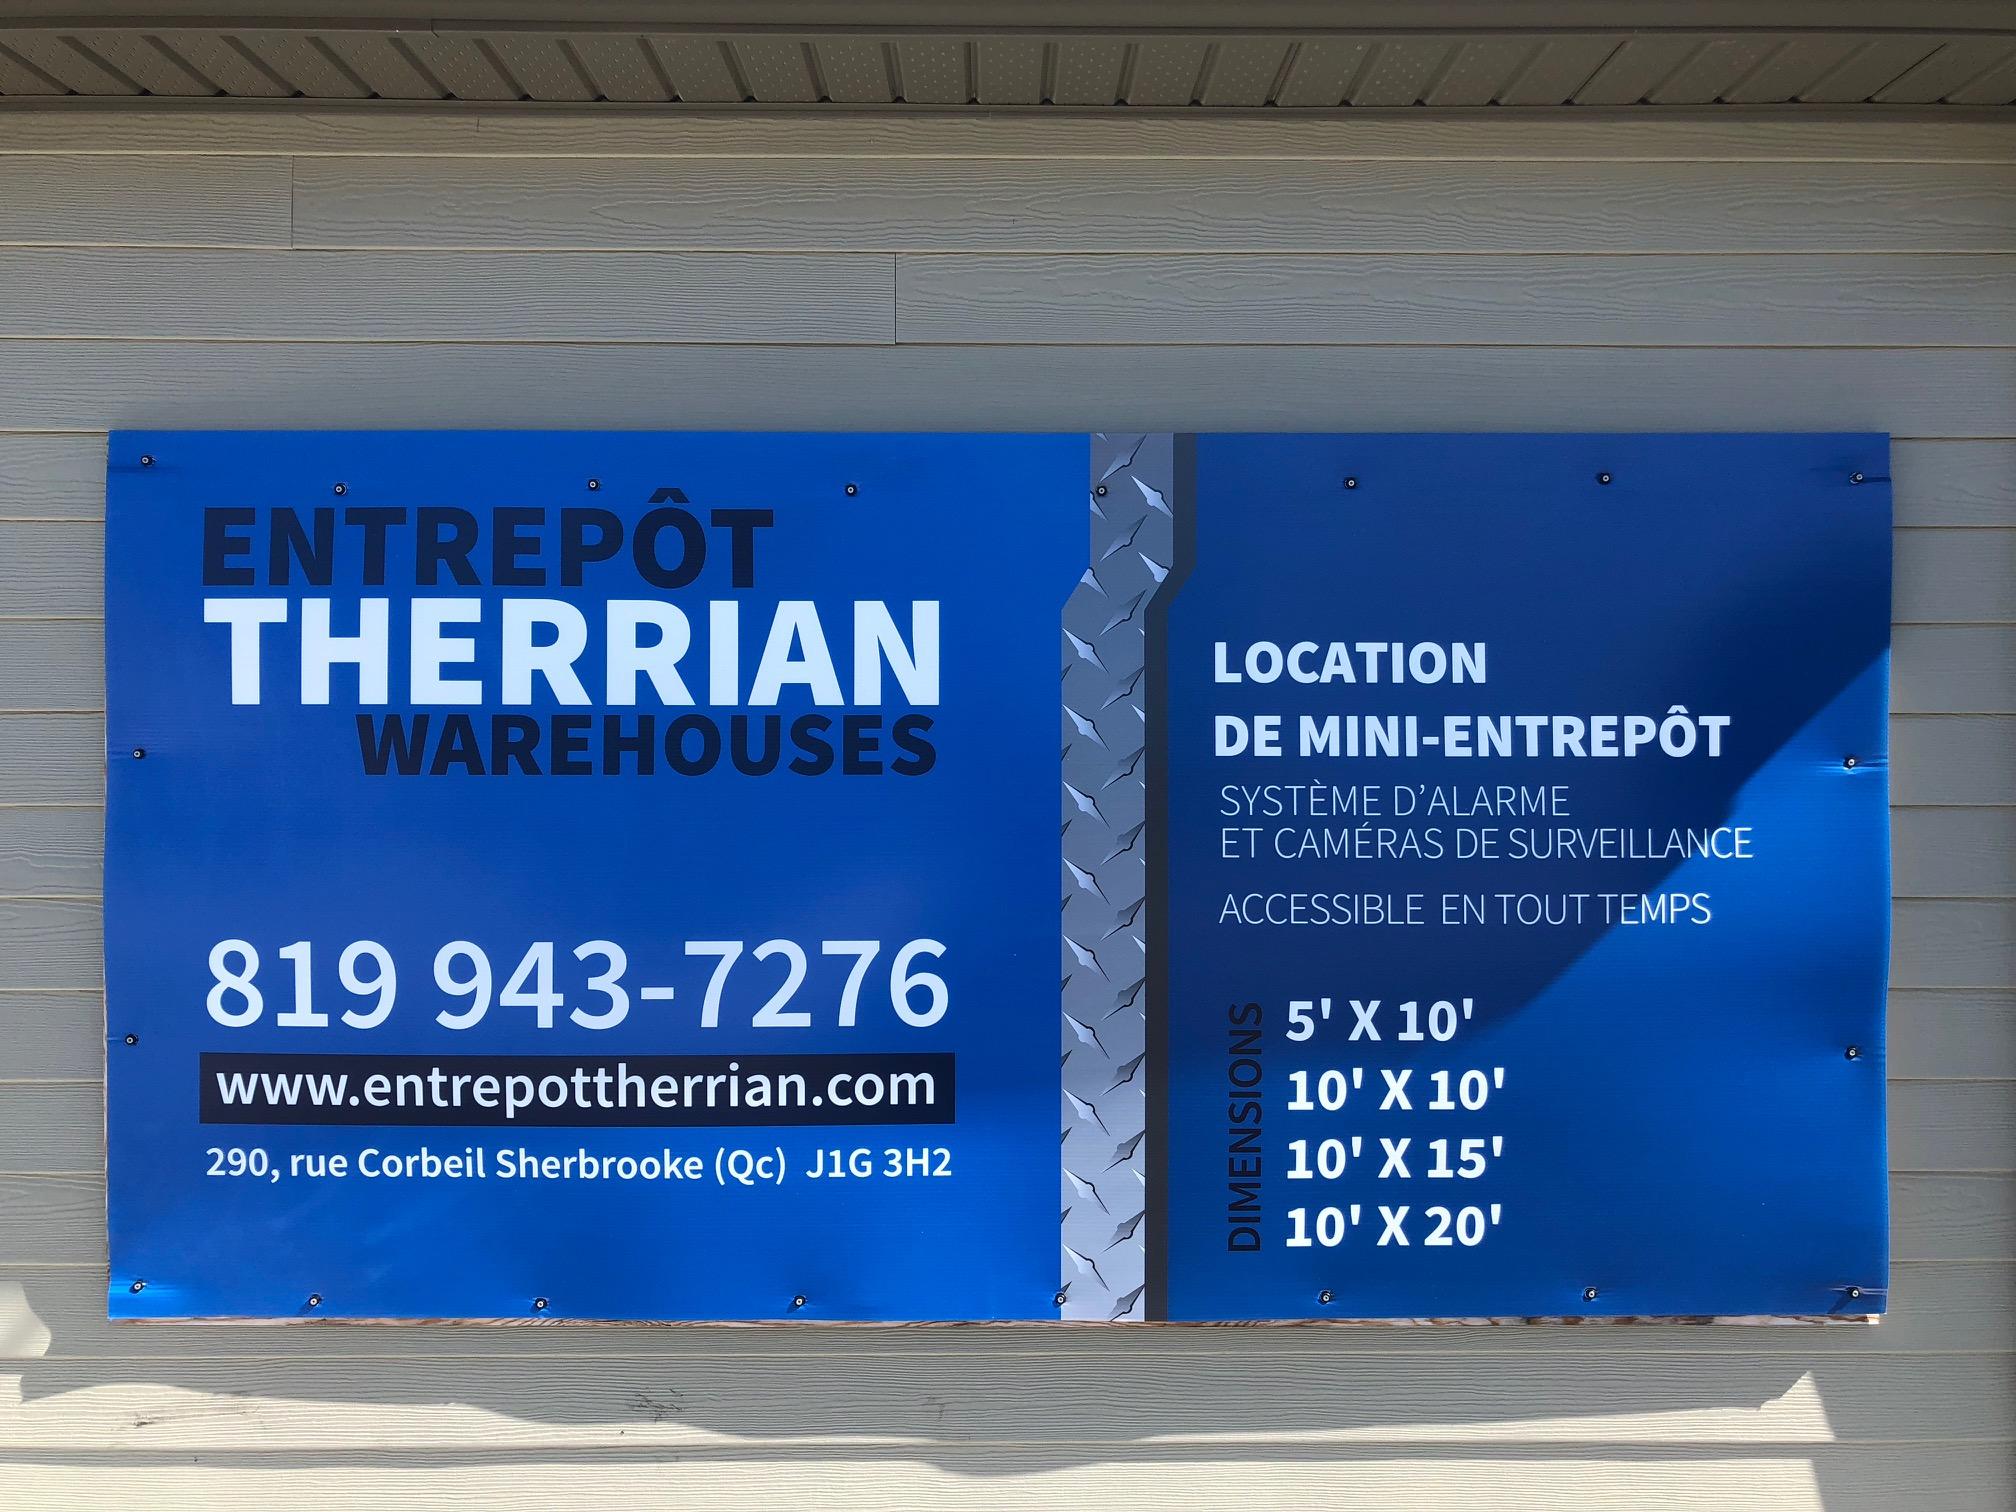 Entrepôt Therrian warehouse